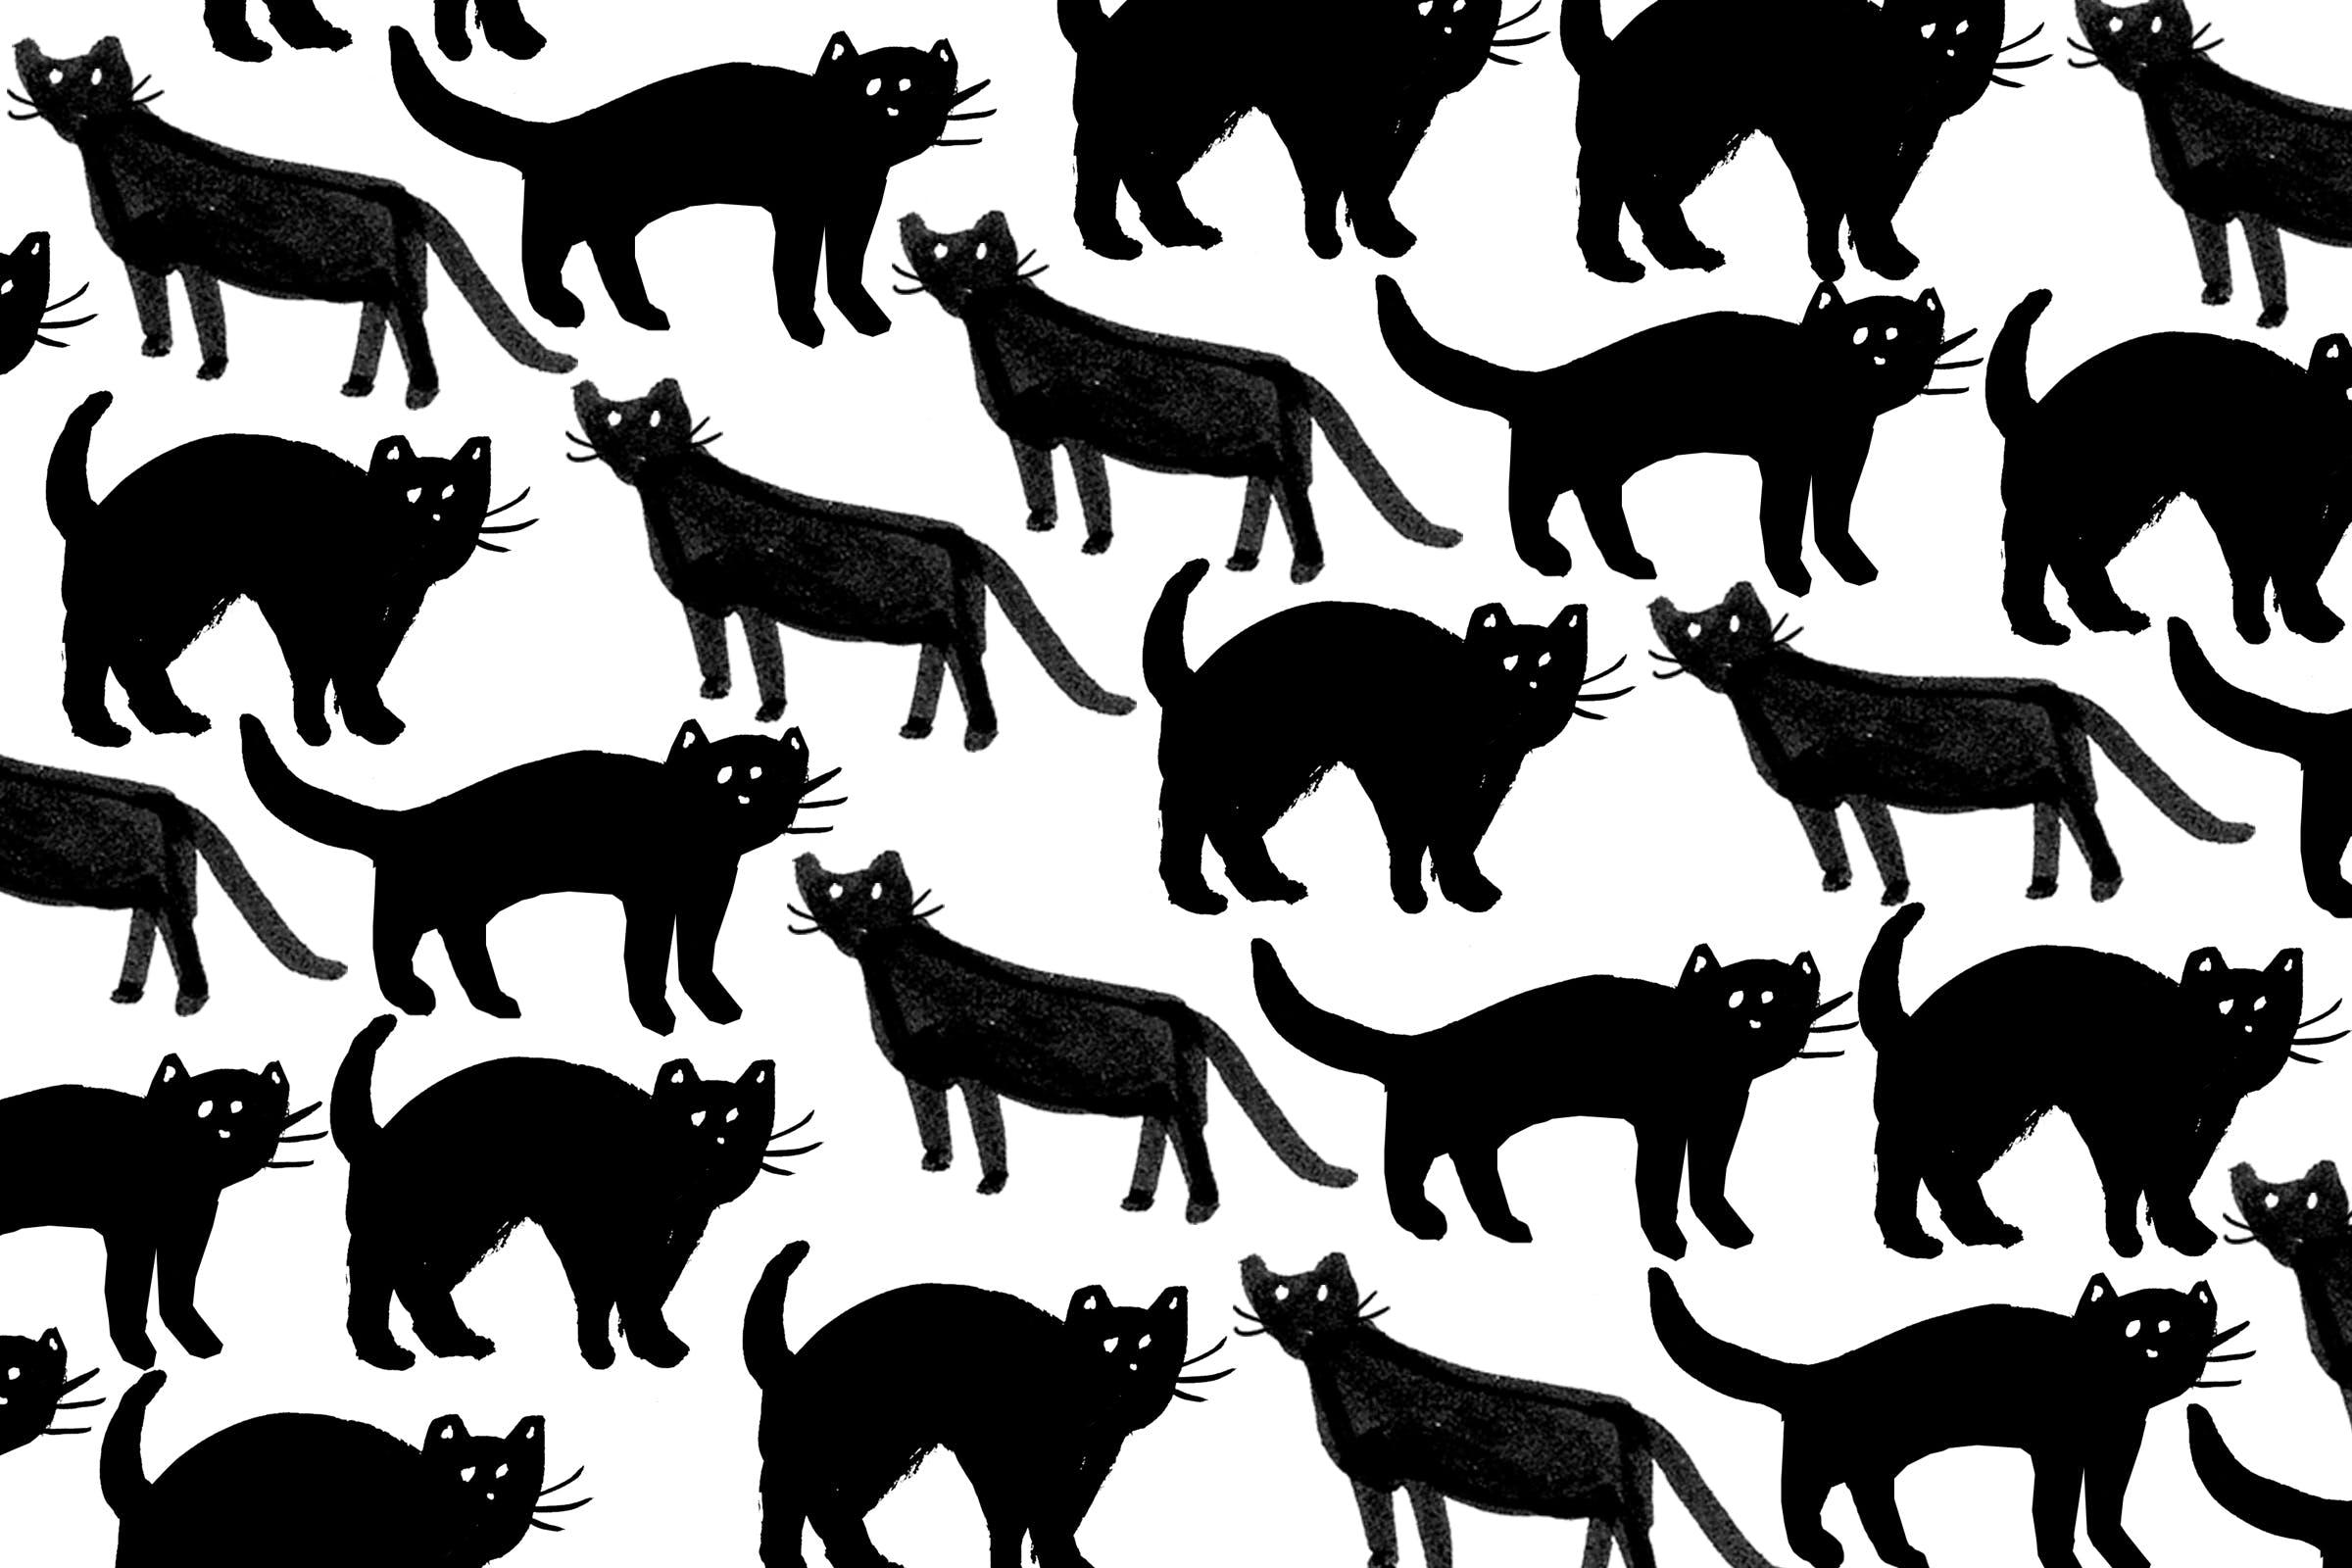 40 408230 cat halloween themed lockscreen